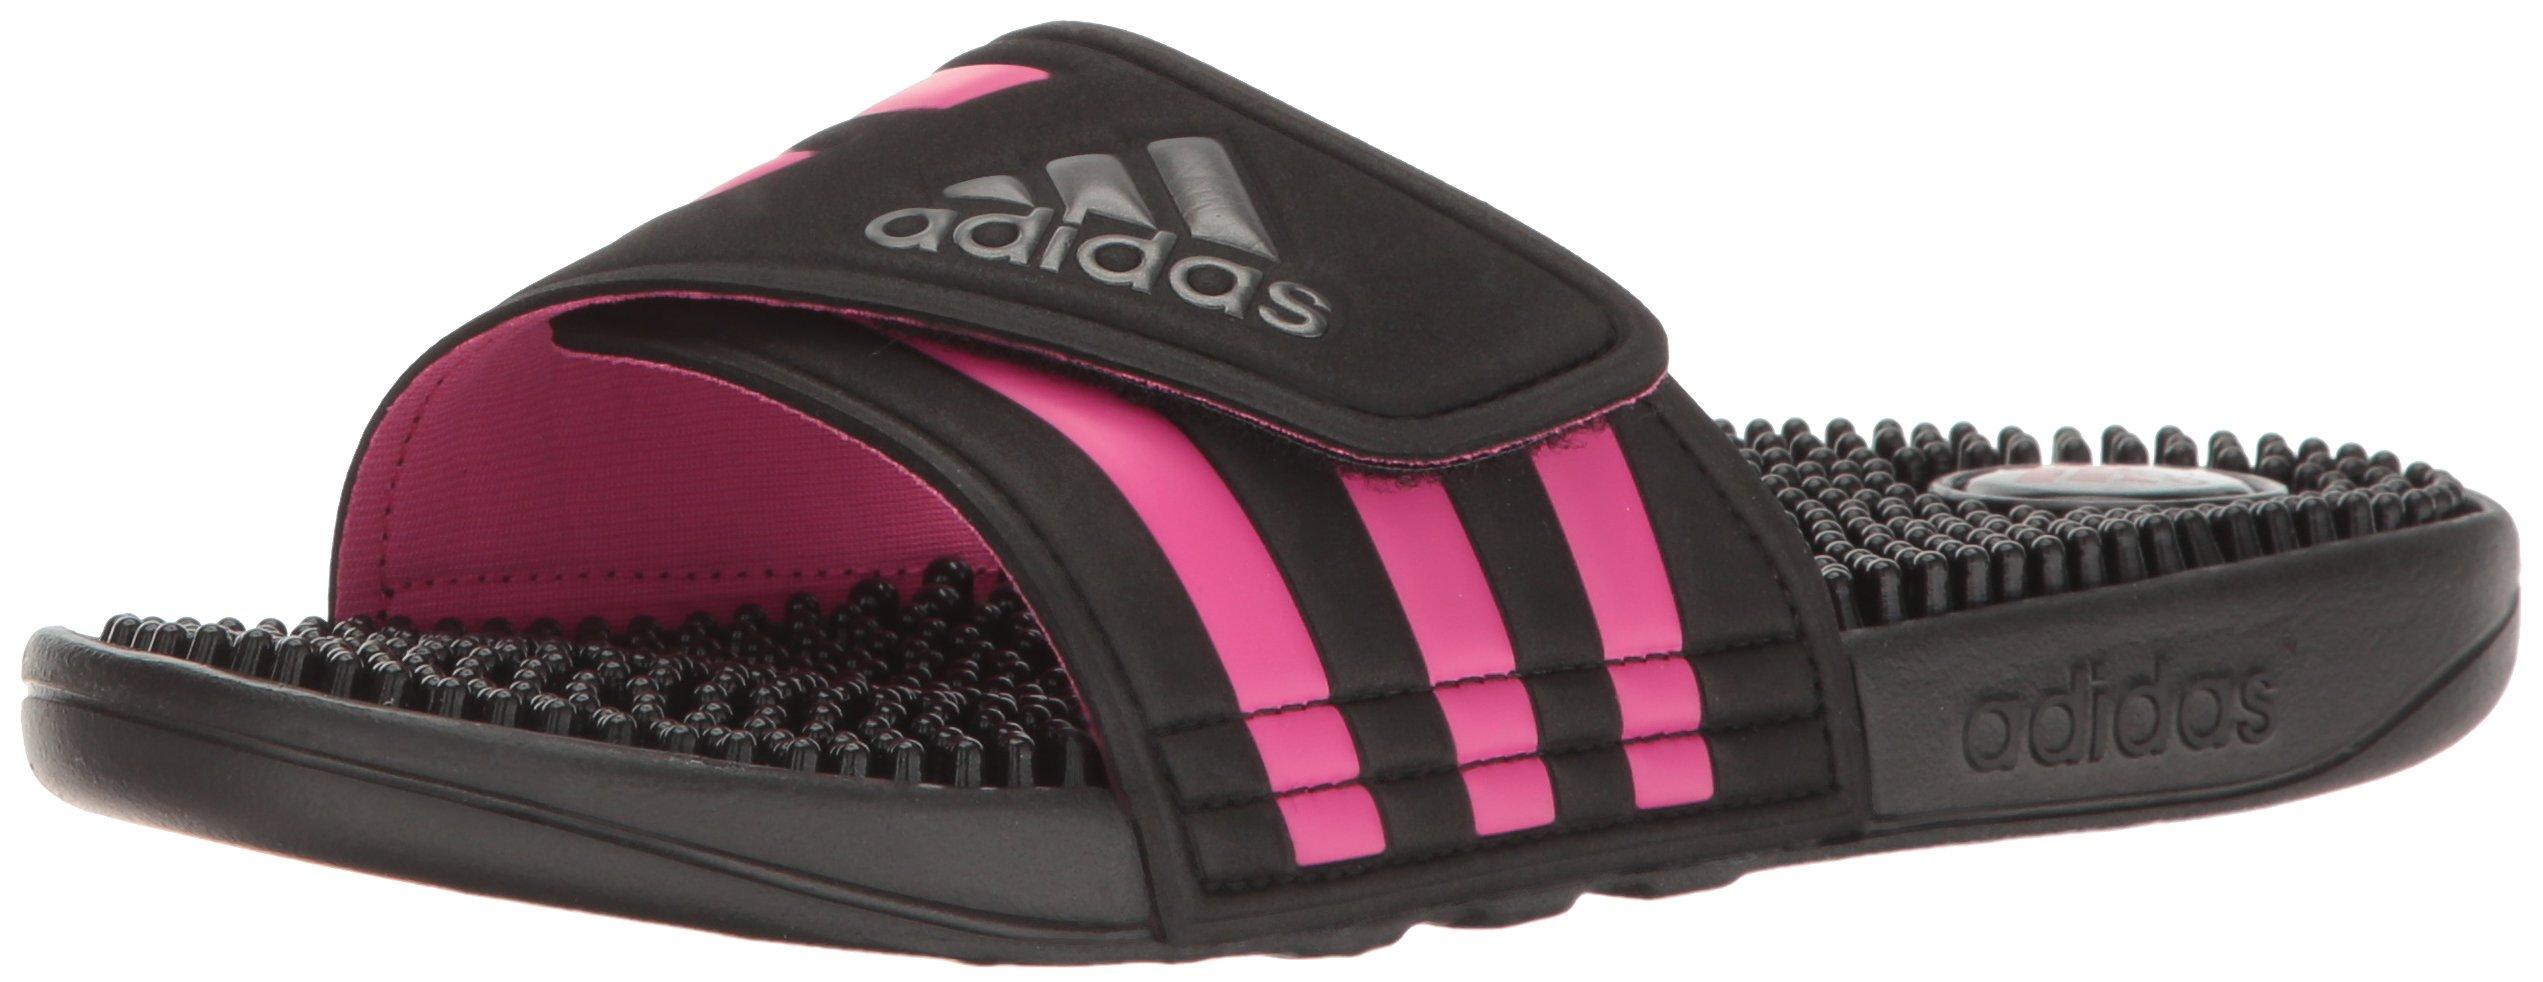 adidas Womens' Shoes | Adissage Slide Sandals, Black/Night Metallic/Shock Pink, (9 M US)